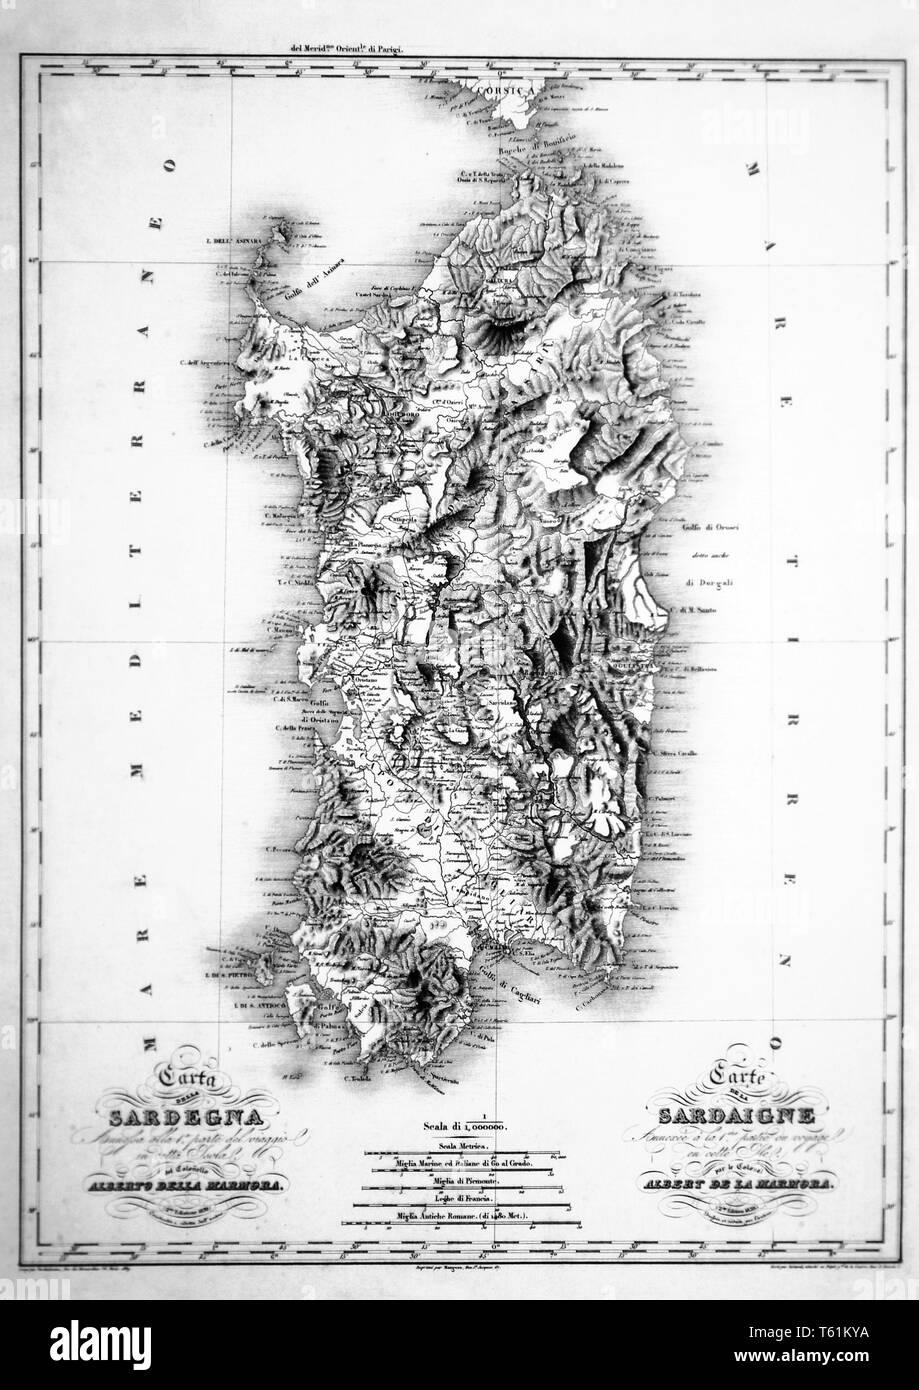 Cartina Antica Sardegna.Sardinia Map Immagini E Fotos Stock Alamy